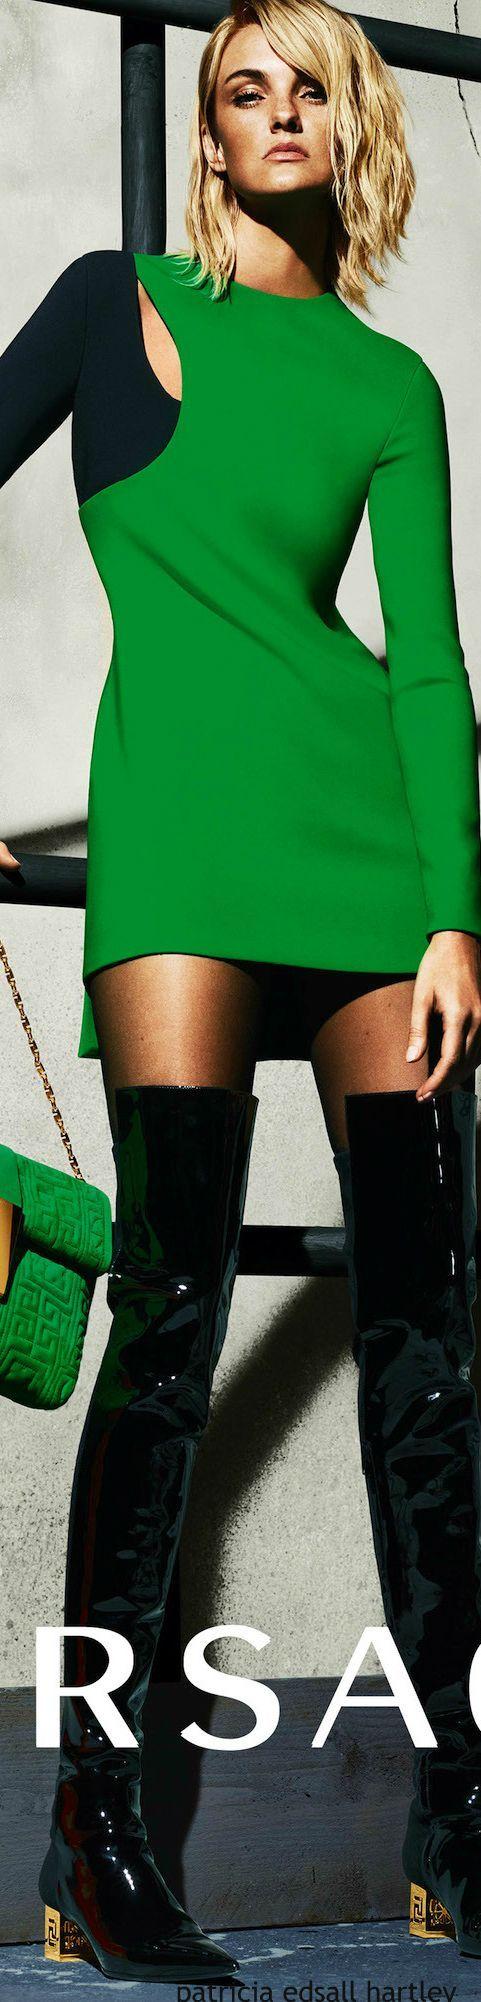 Versace 2015-16 Ad Campaign: